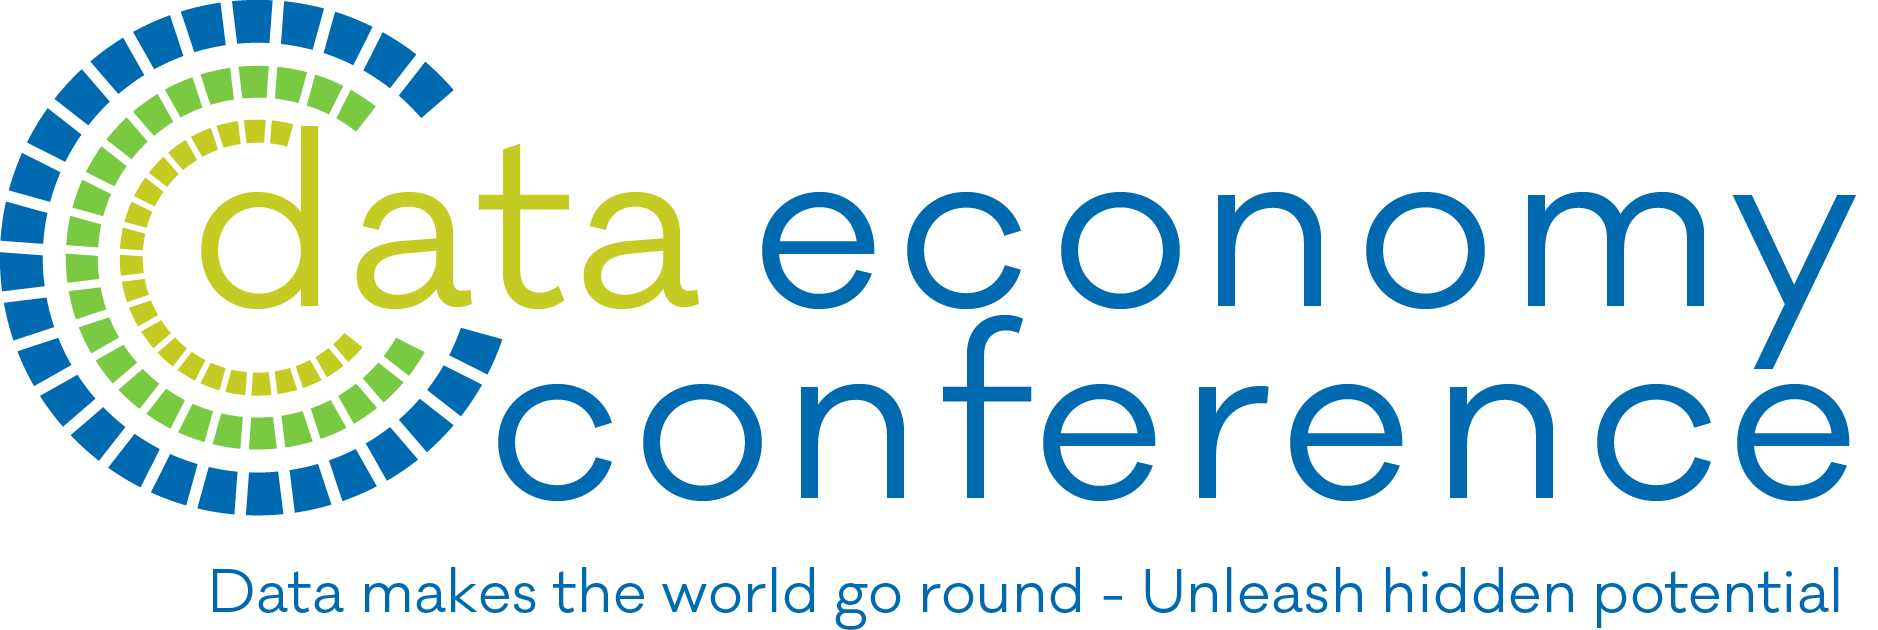 Data Economy Conference